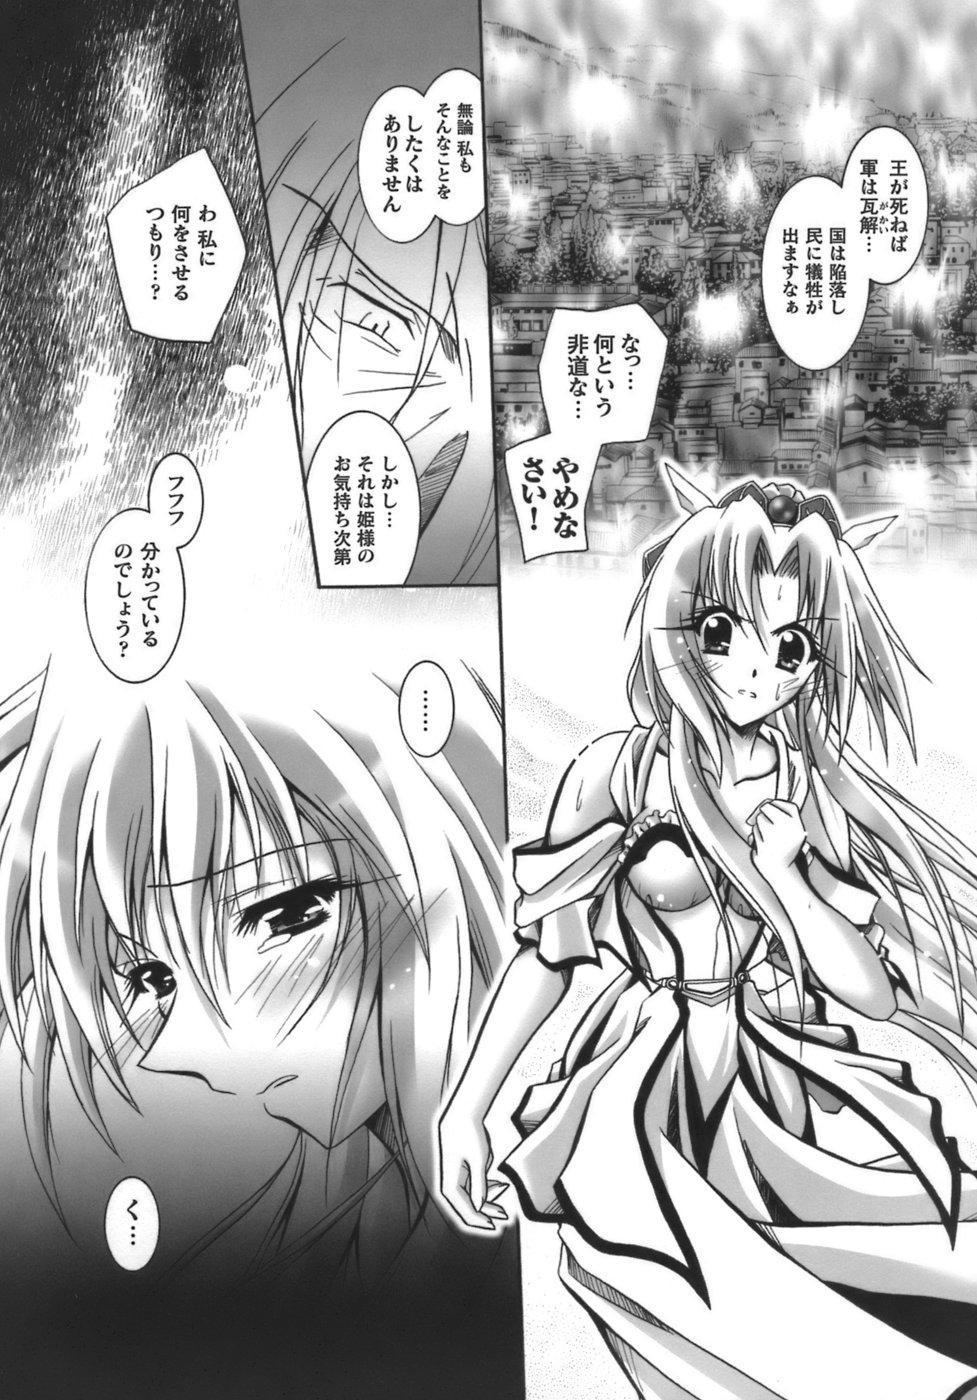 [Parfait] Datenshi-tachi no Chinkonka - Fallen Angels Requiem 28